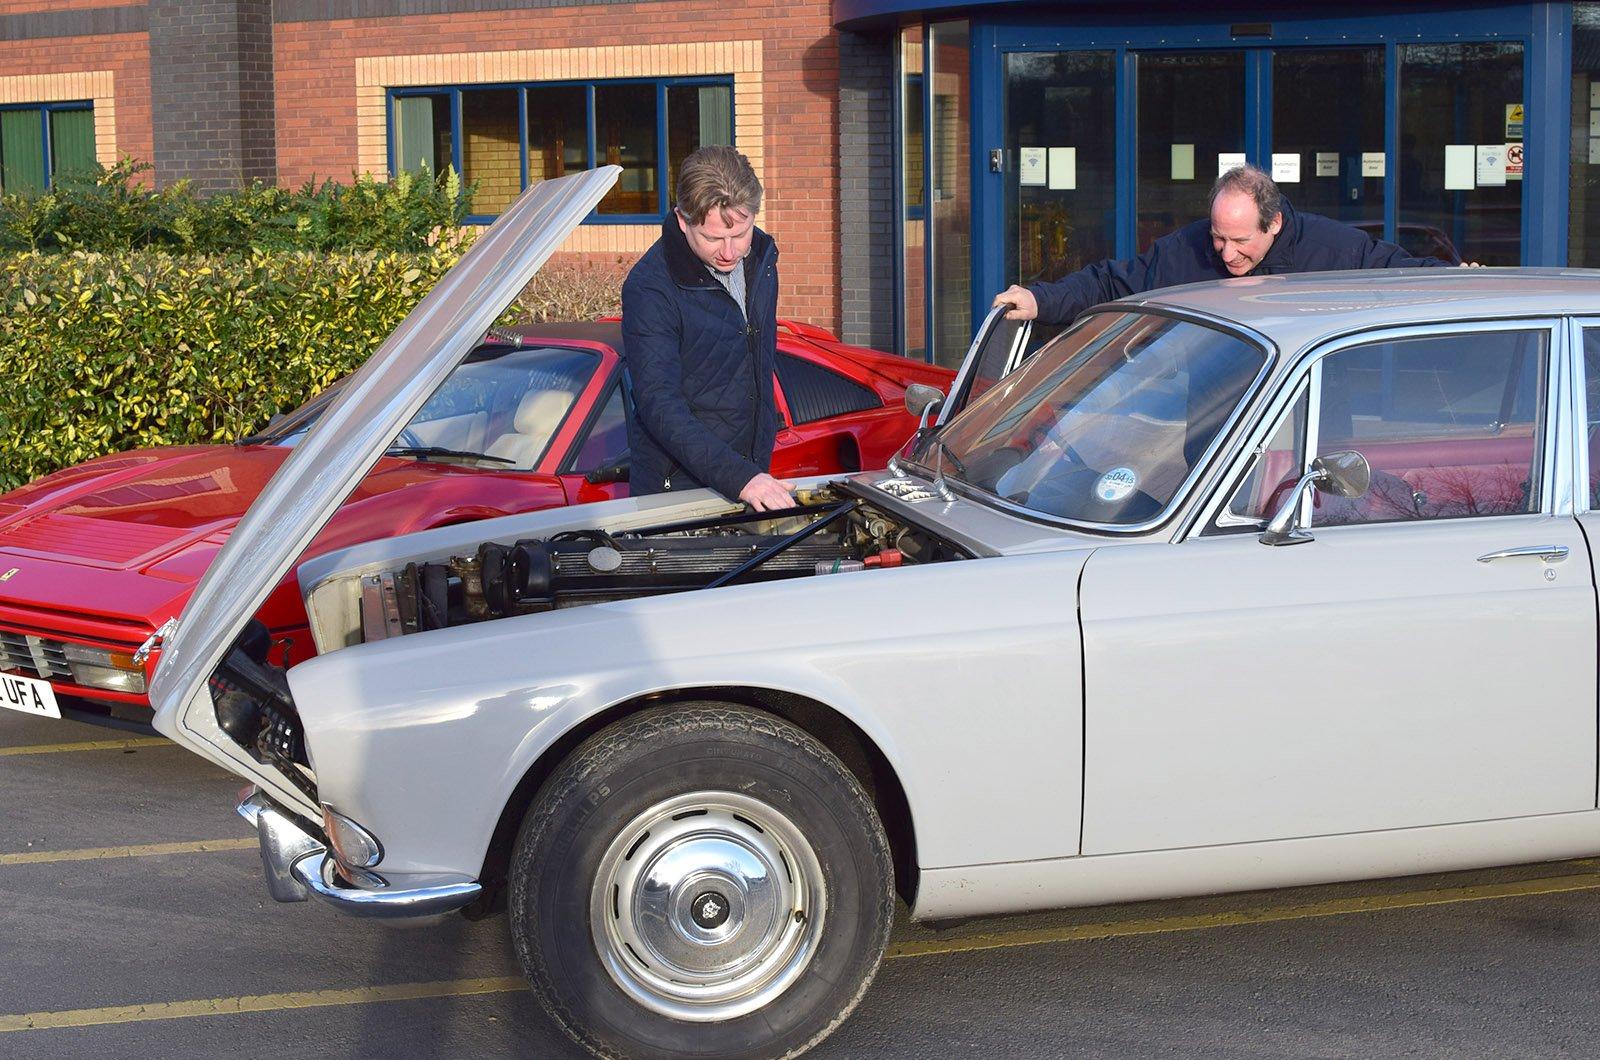 Man inspecting blue classic car